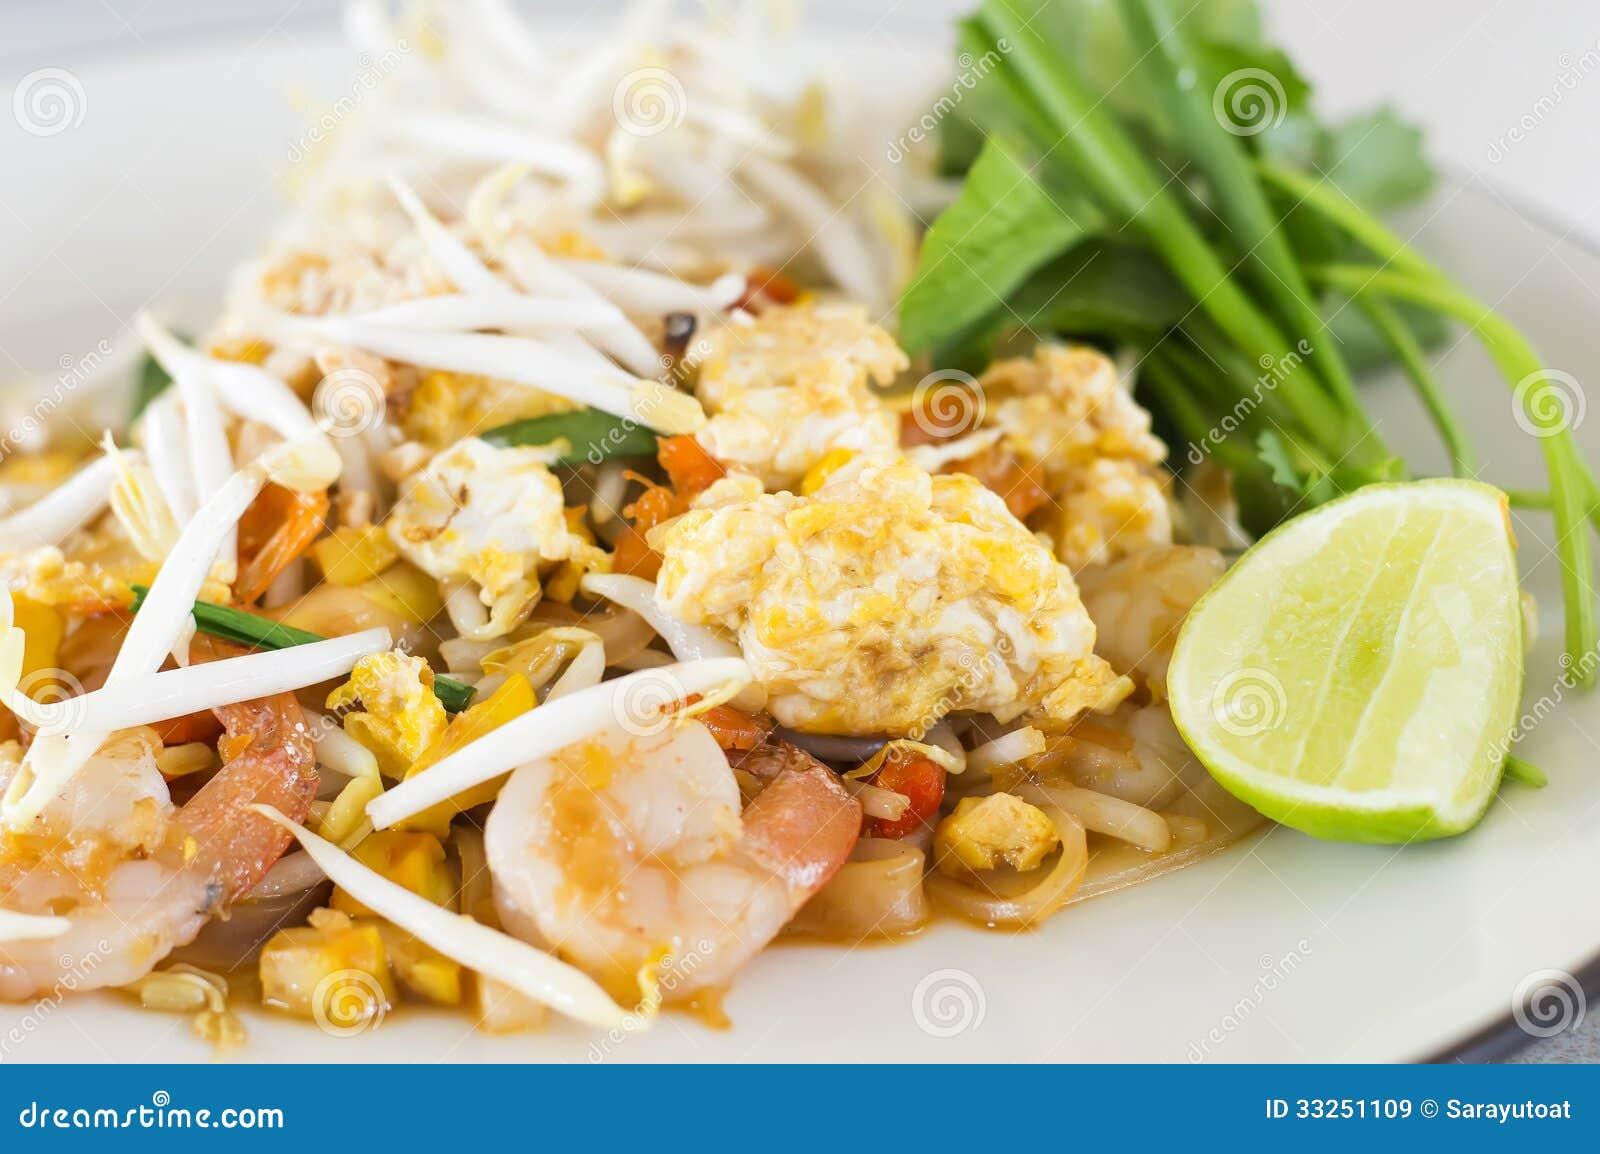 Pad Thai Stir-fried Rice Noodles,Stir Fry Noodles With ...